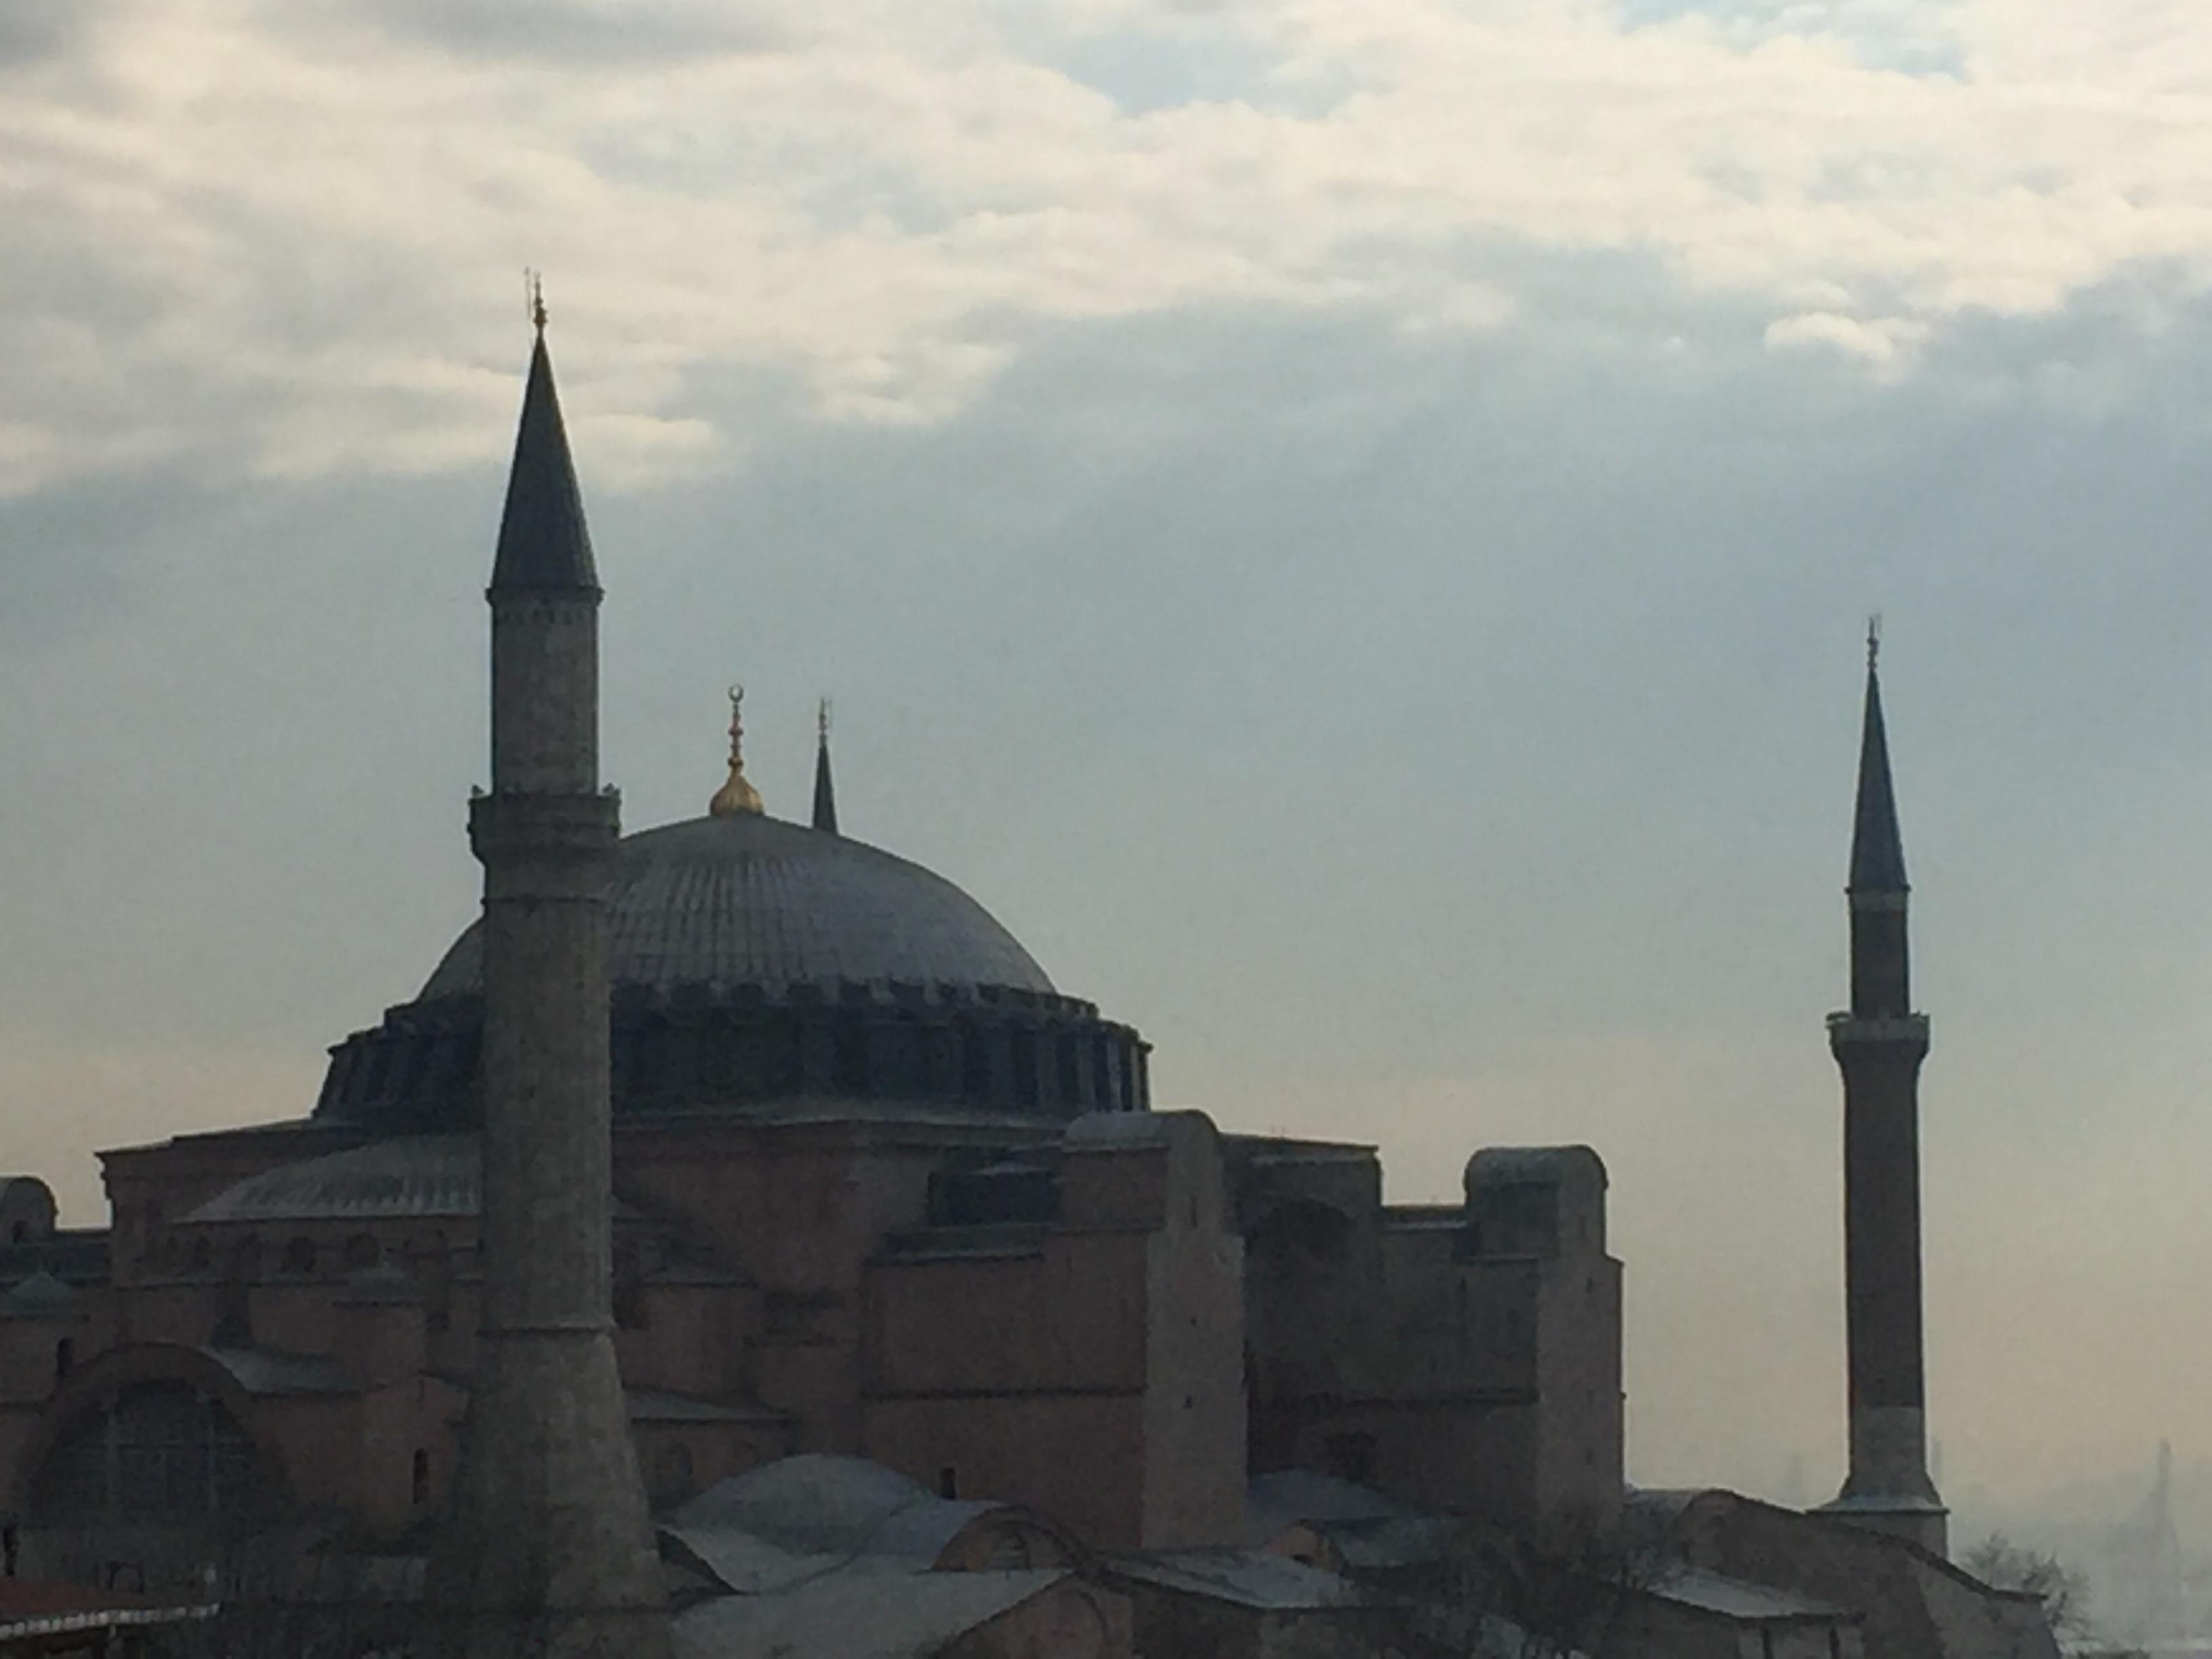 Hagia Sophia, from the terrace